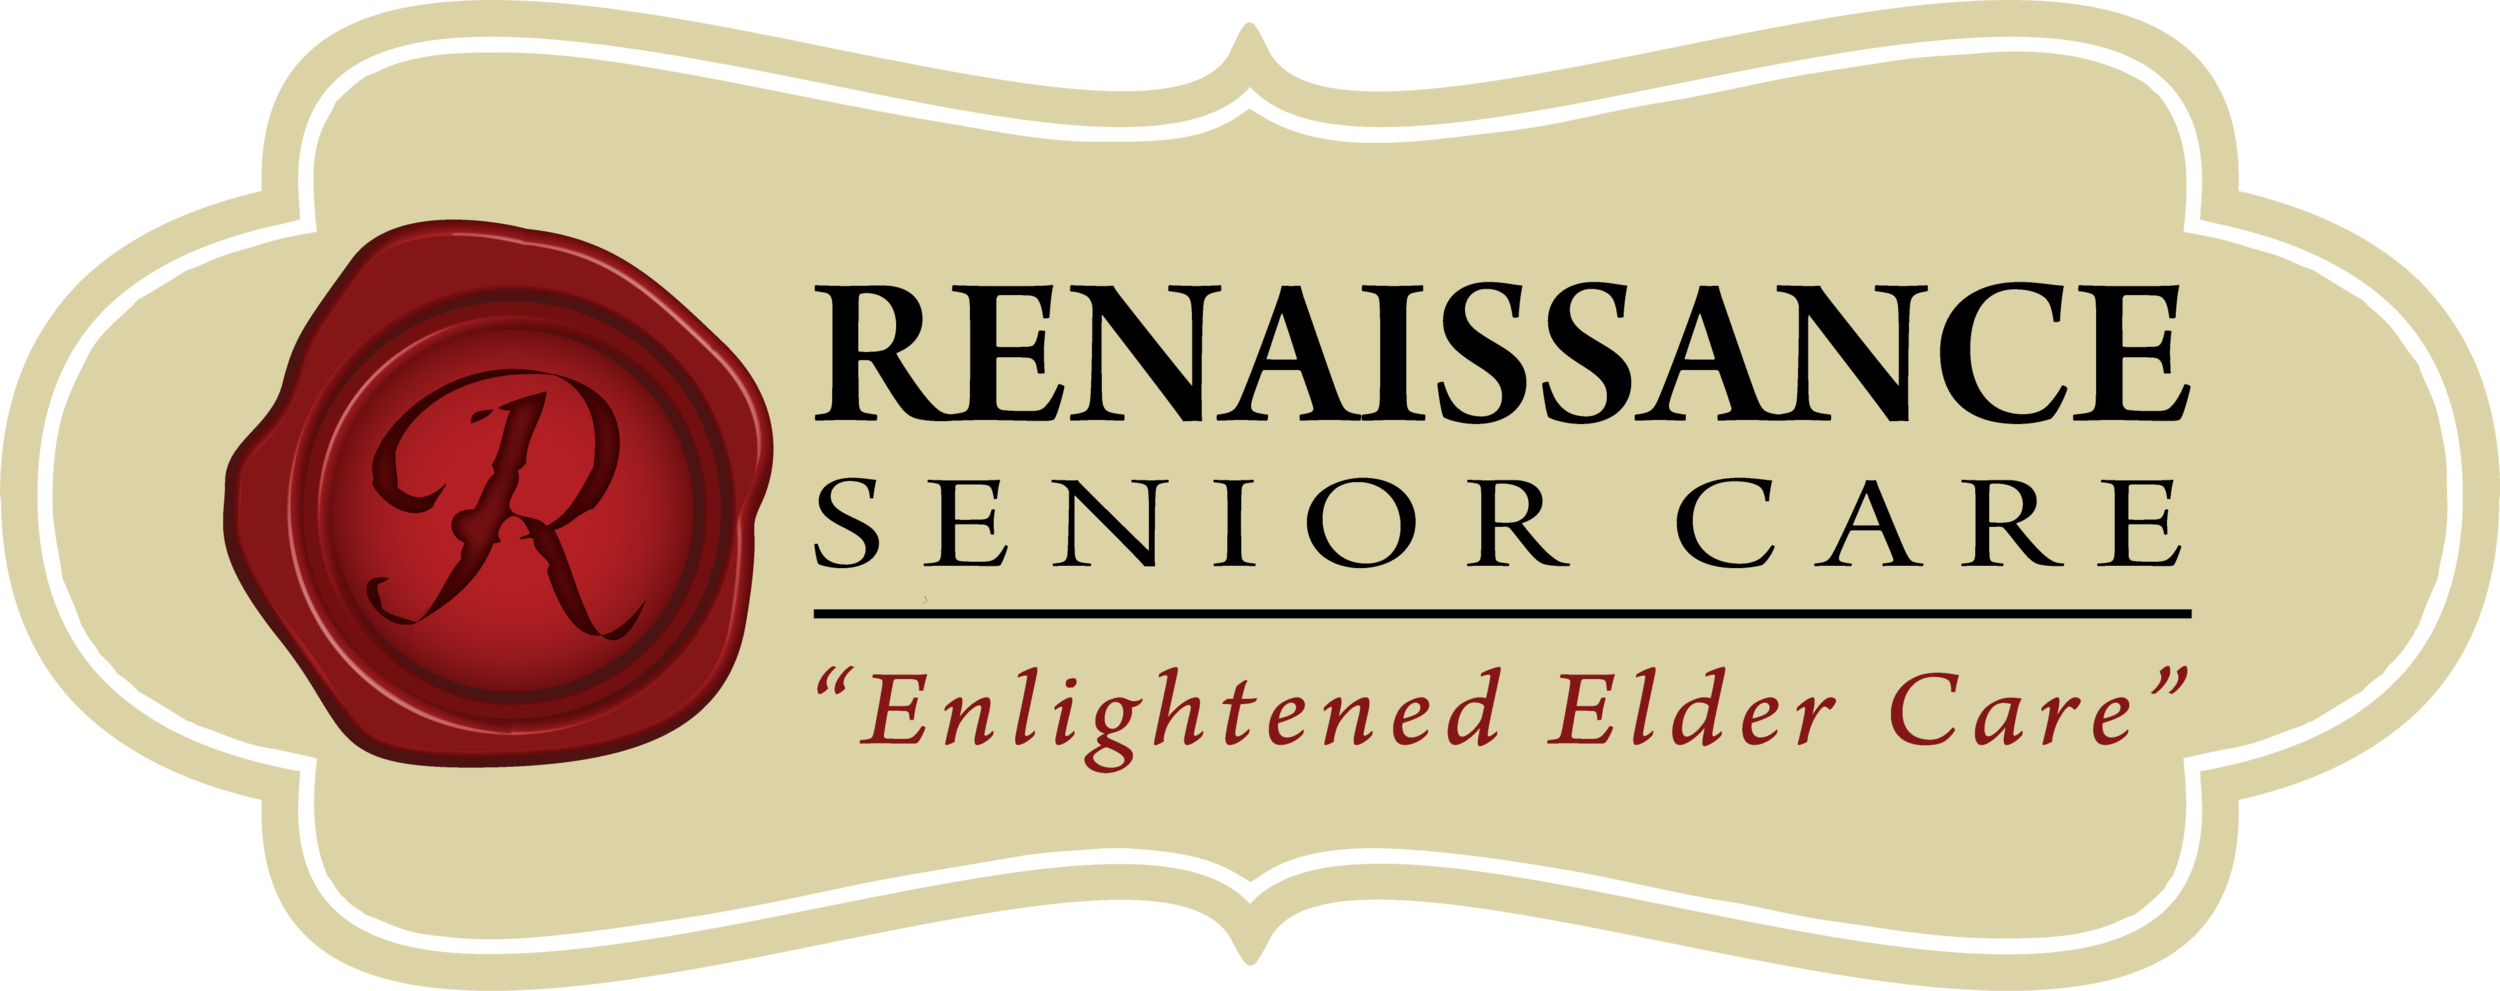 Renaissance_logo_on background.png